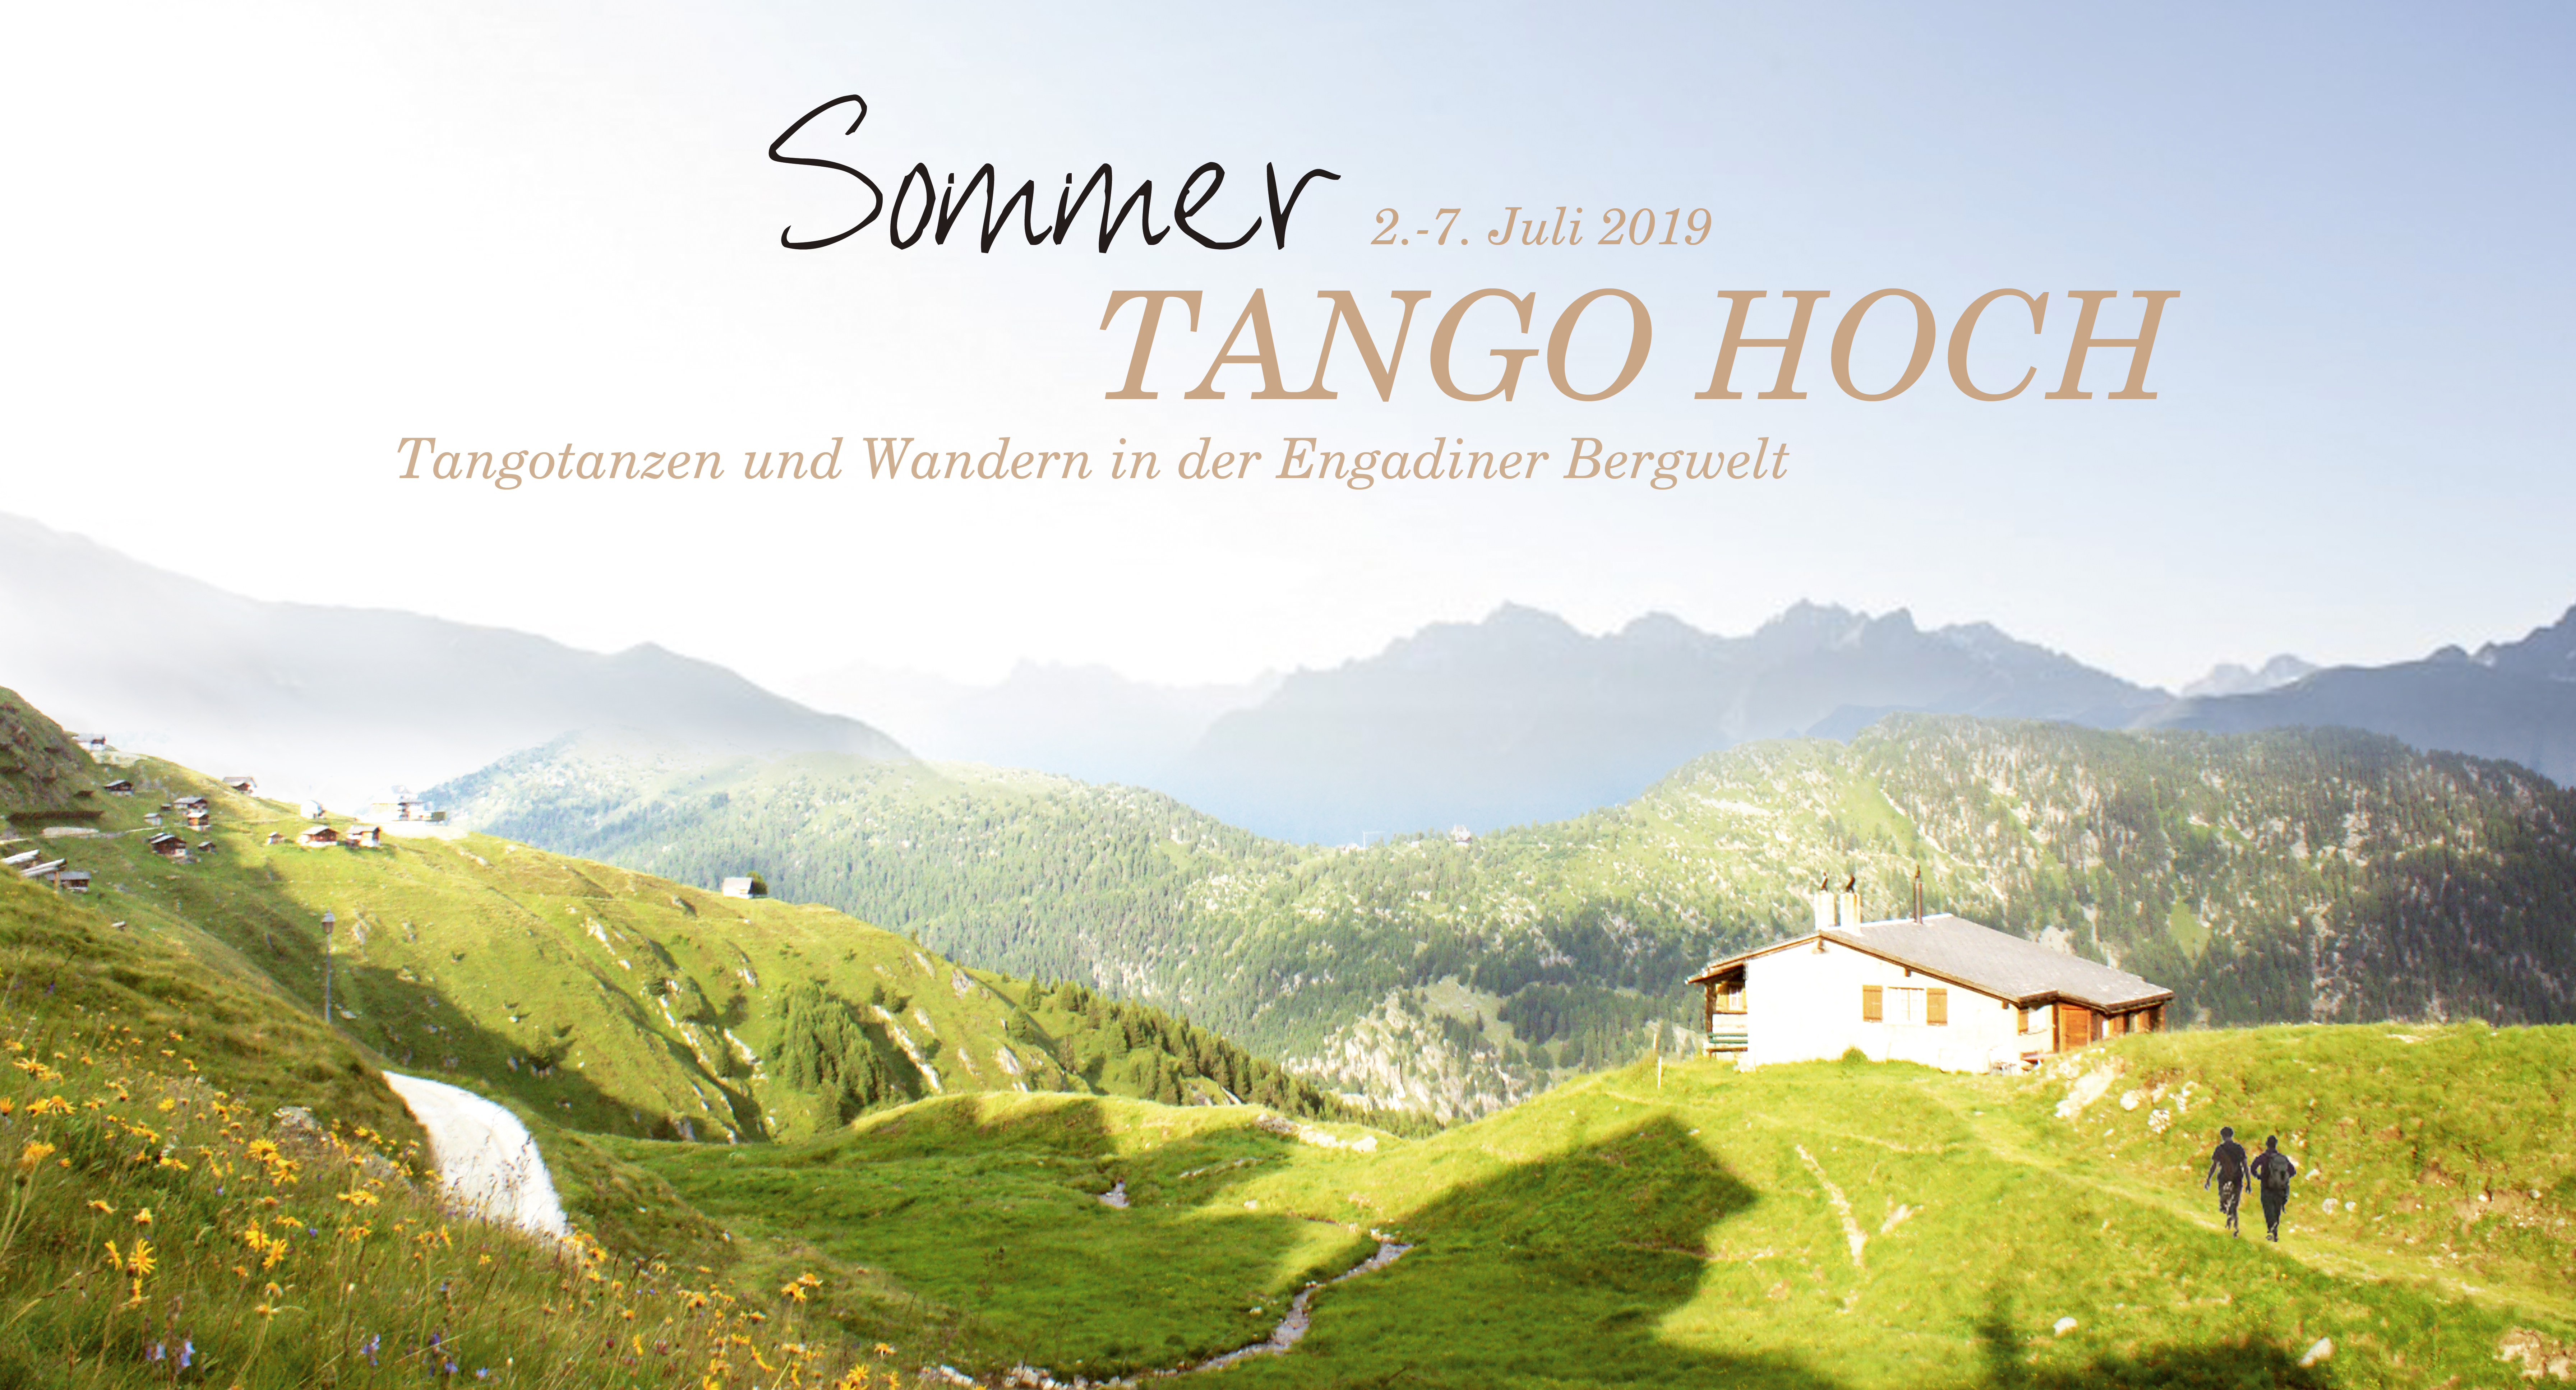 Sommer Tango hoch im Engadin